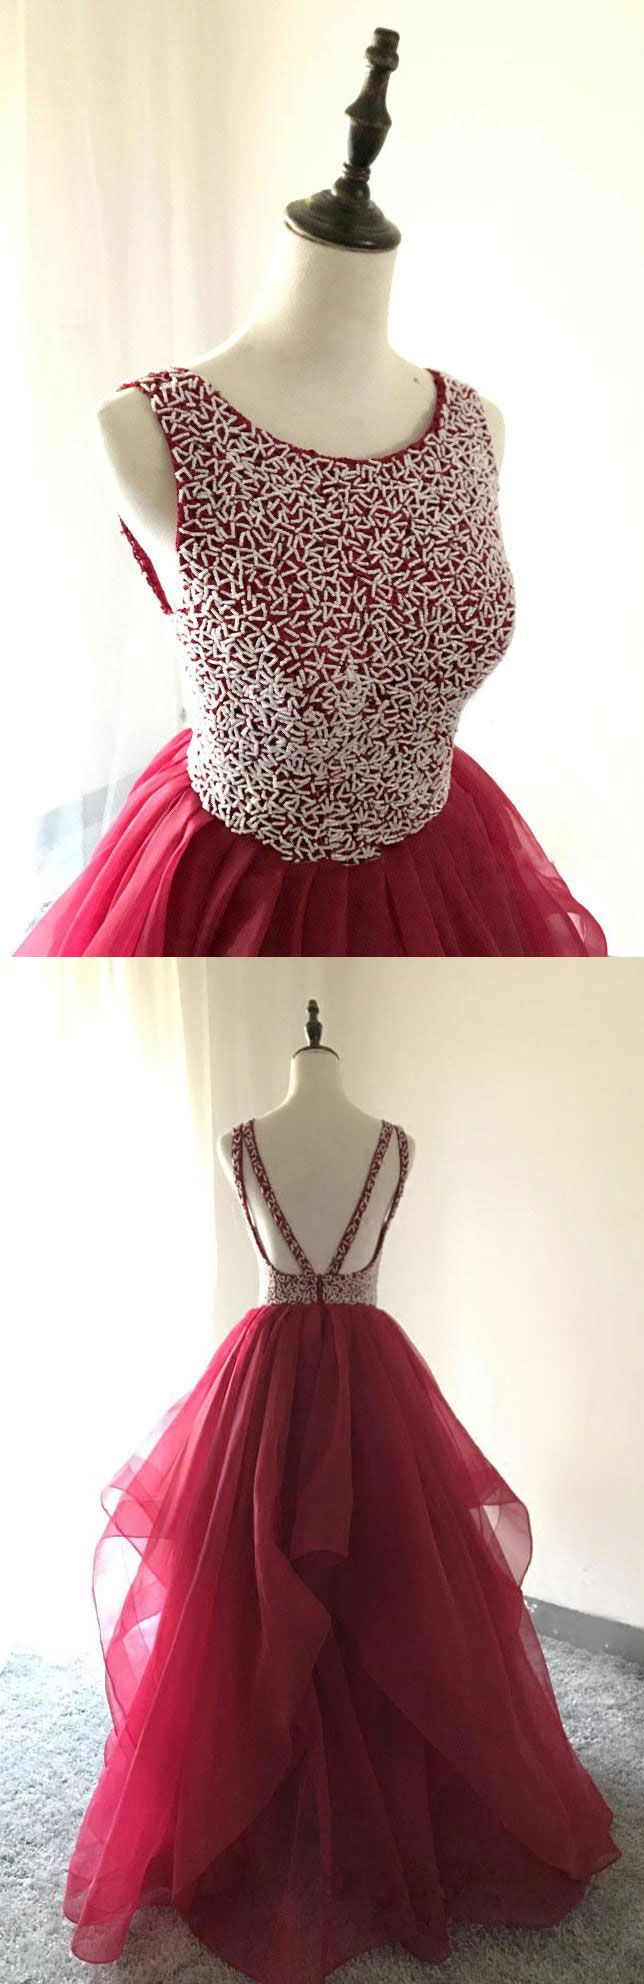 Beaded long prom dresses dresses for women red backless prom